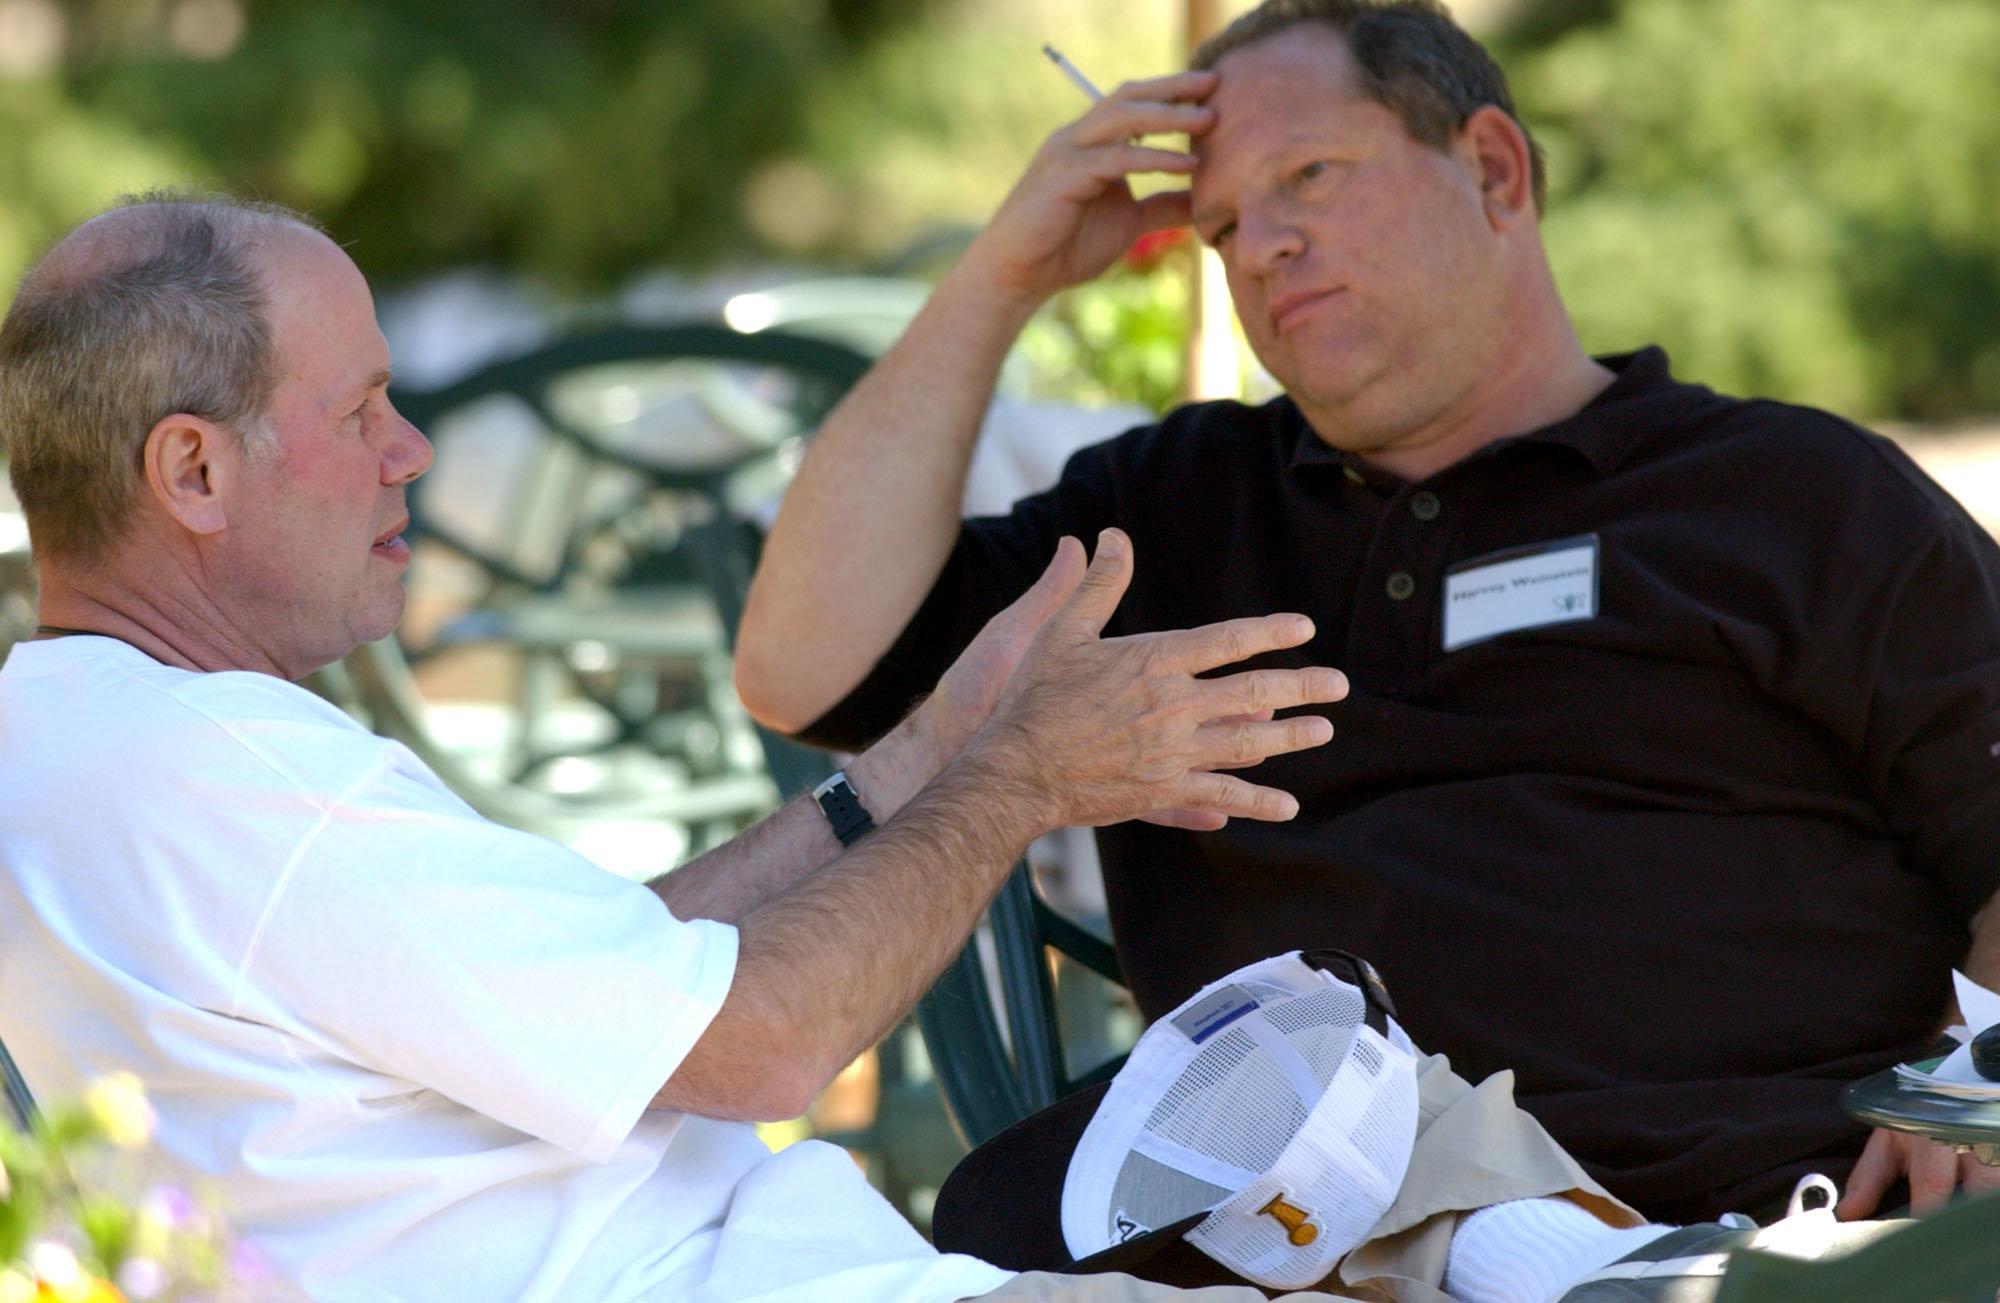 Michael Eisner, then CEO of the Walt Disney Company, talks with Harvey Weinsteinback in 2004.